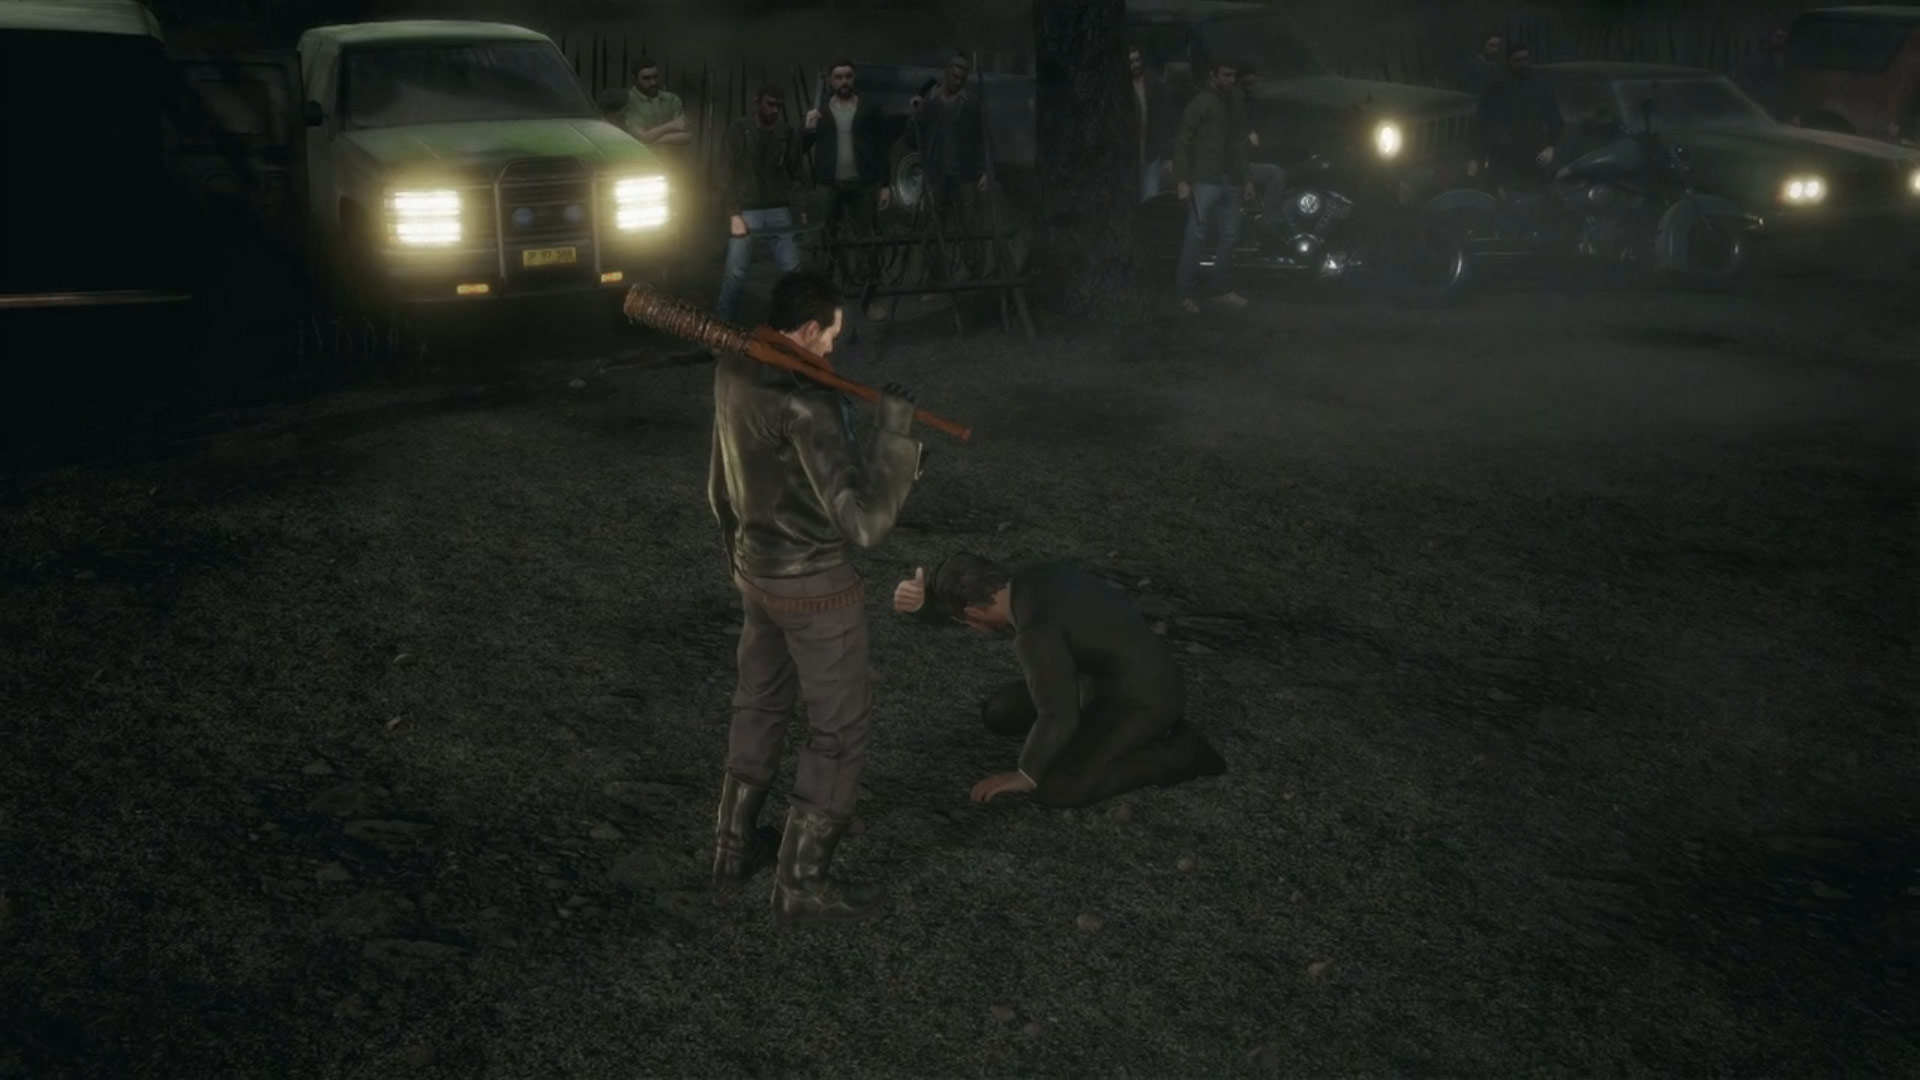 Tekken 7 Julia and Negan Reveal Screenshots 11 out of 12 image gallery